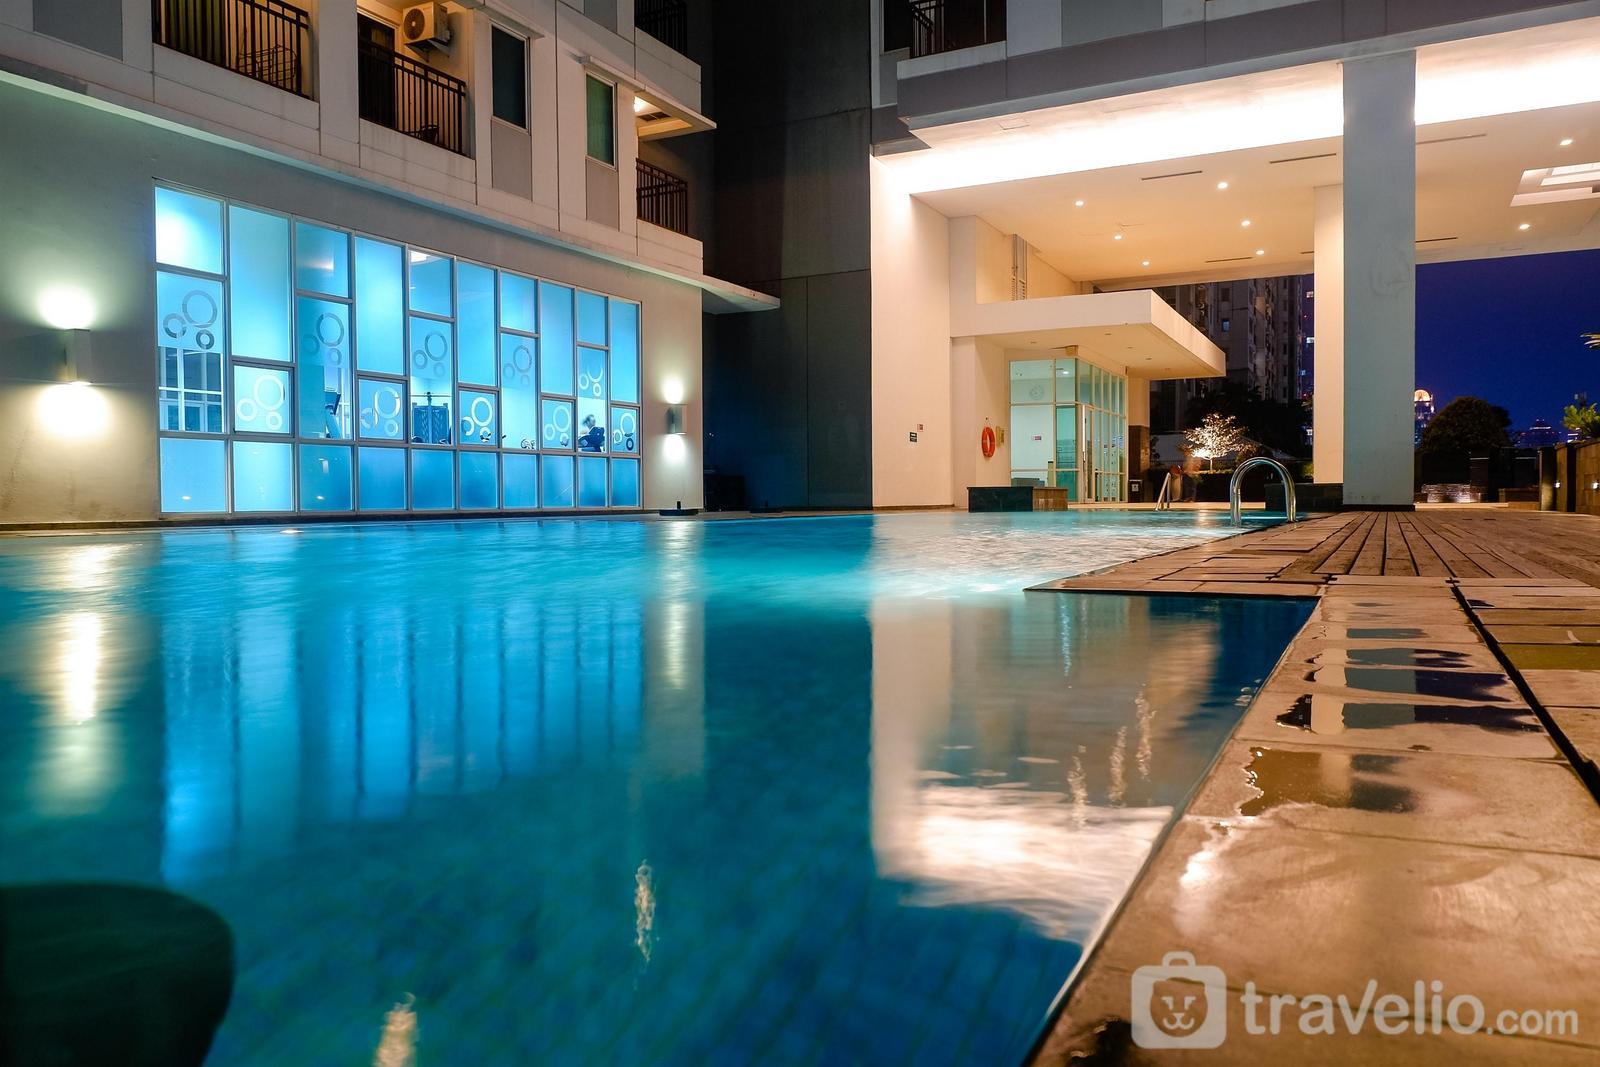 Apartemen Thamrin Executive - Strategic and Best Choice Studio Apartment Thamrin Executive By Travelio